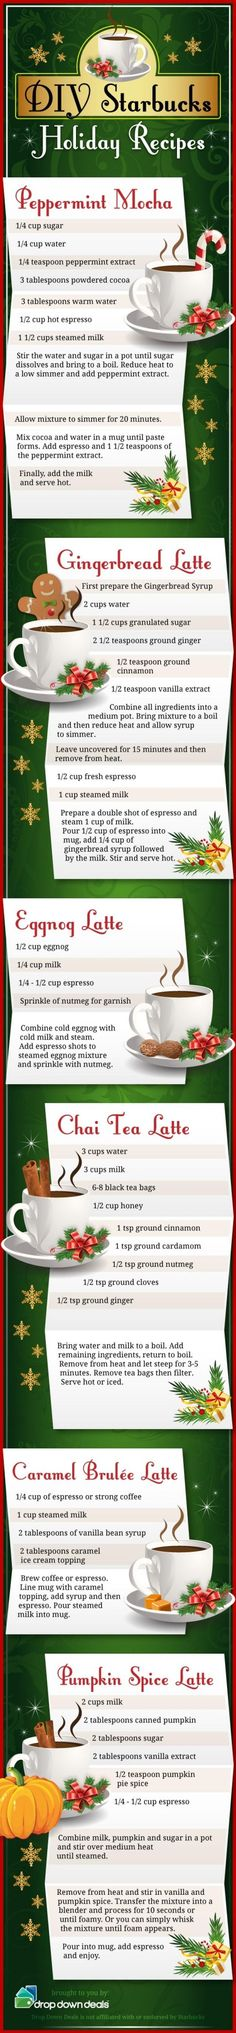 DIY Starbucks holiday drink recipes christmas winter